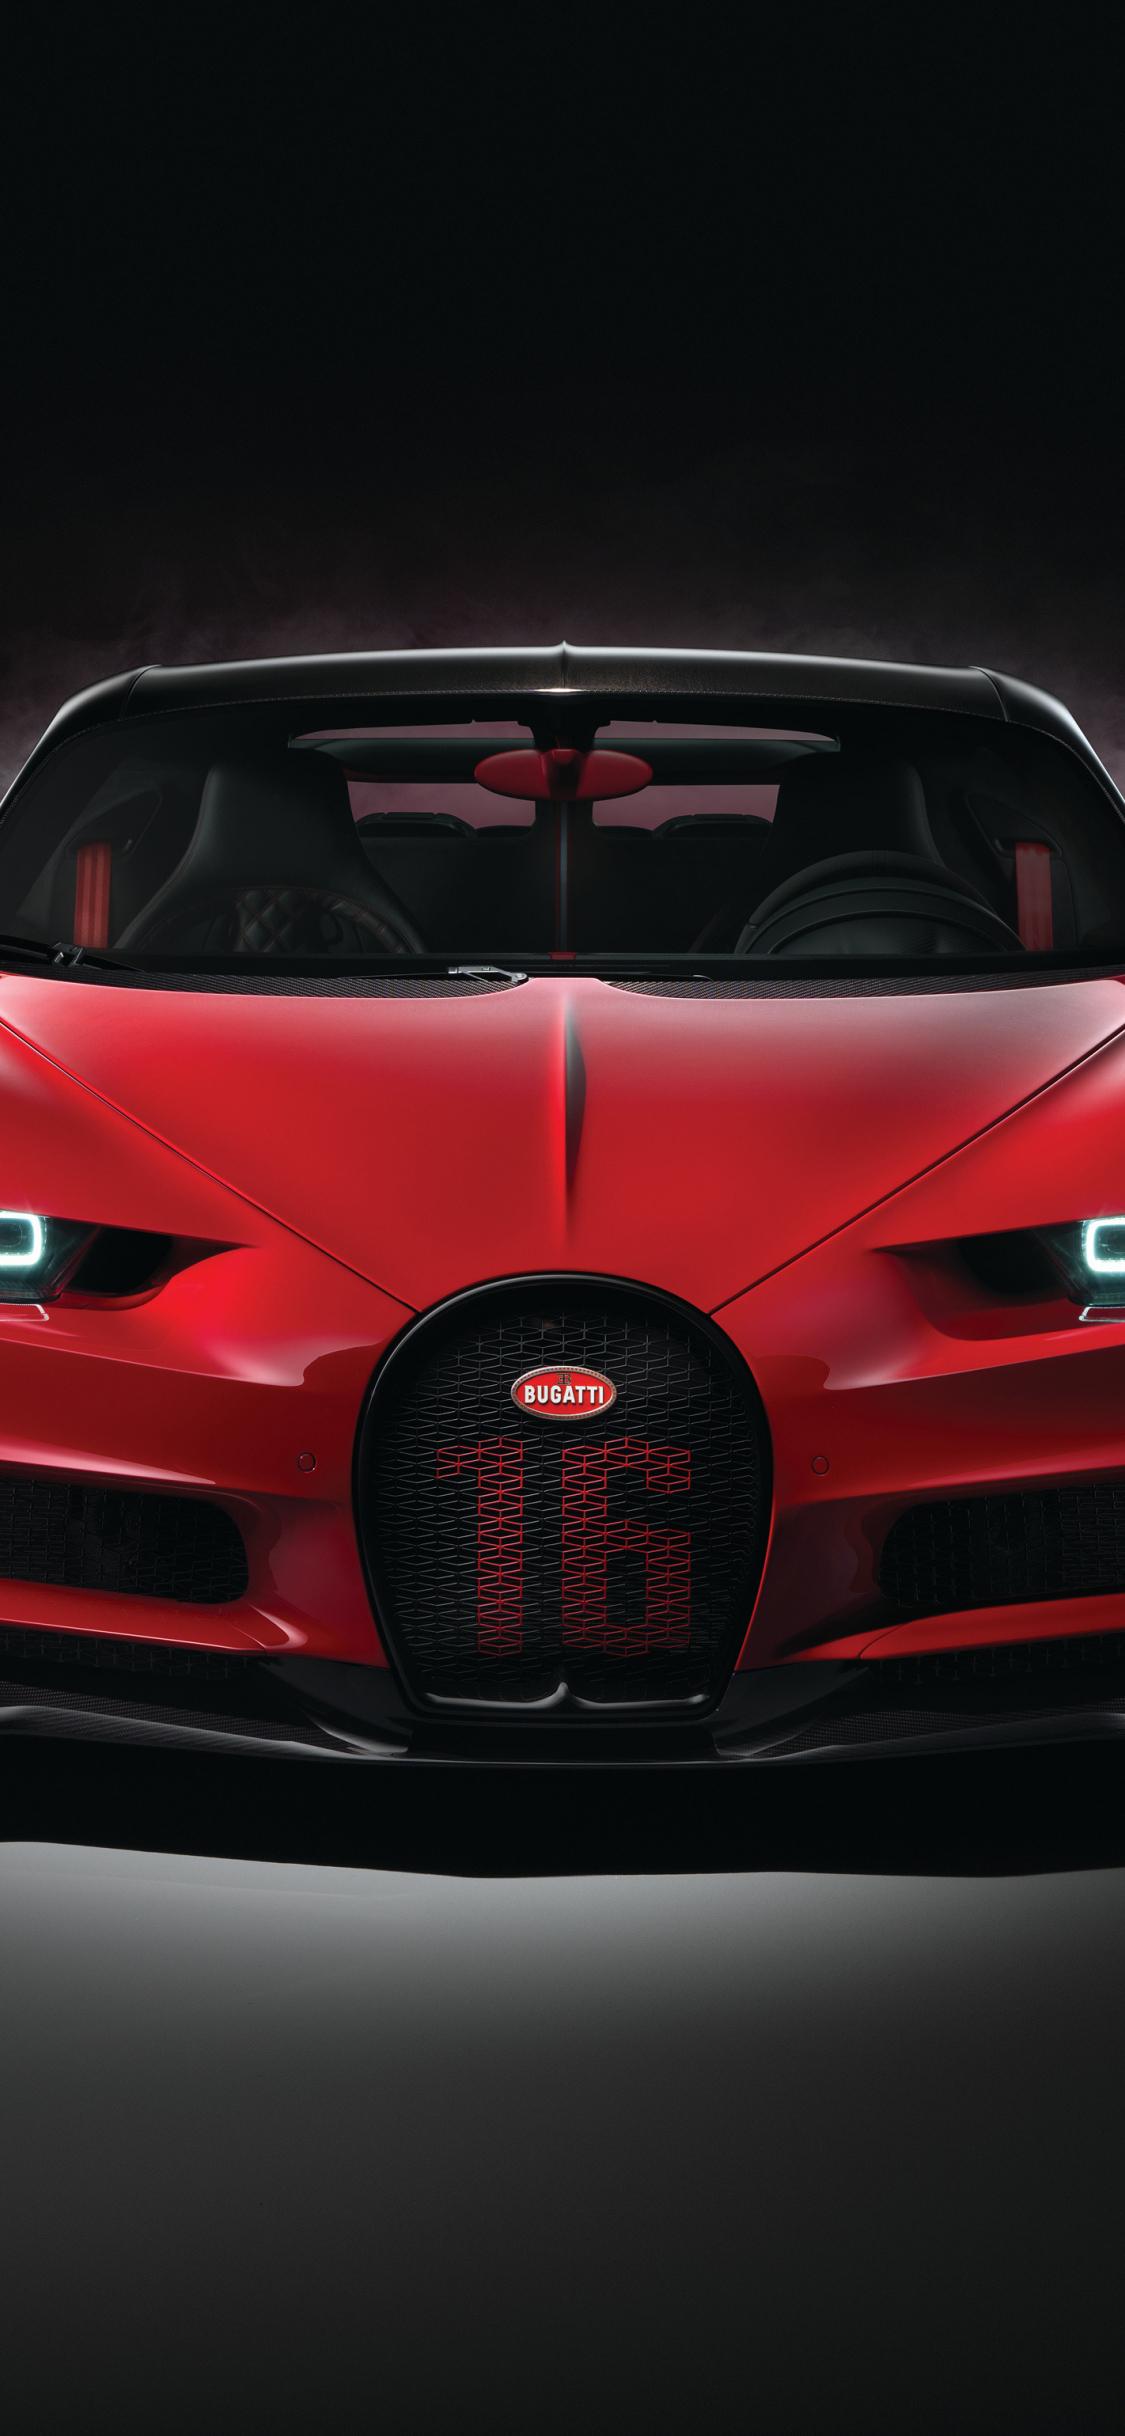 Download 1125x2436 Wallpaper Red Car Bugatti Chiron Sport Luxury